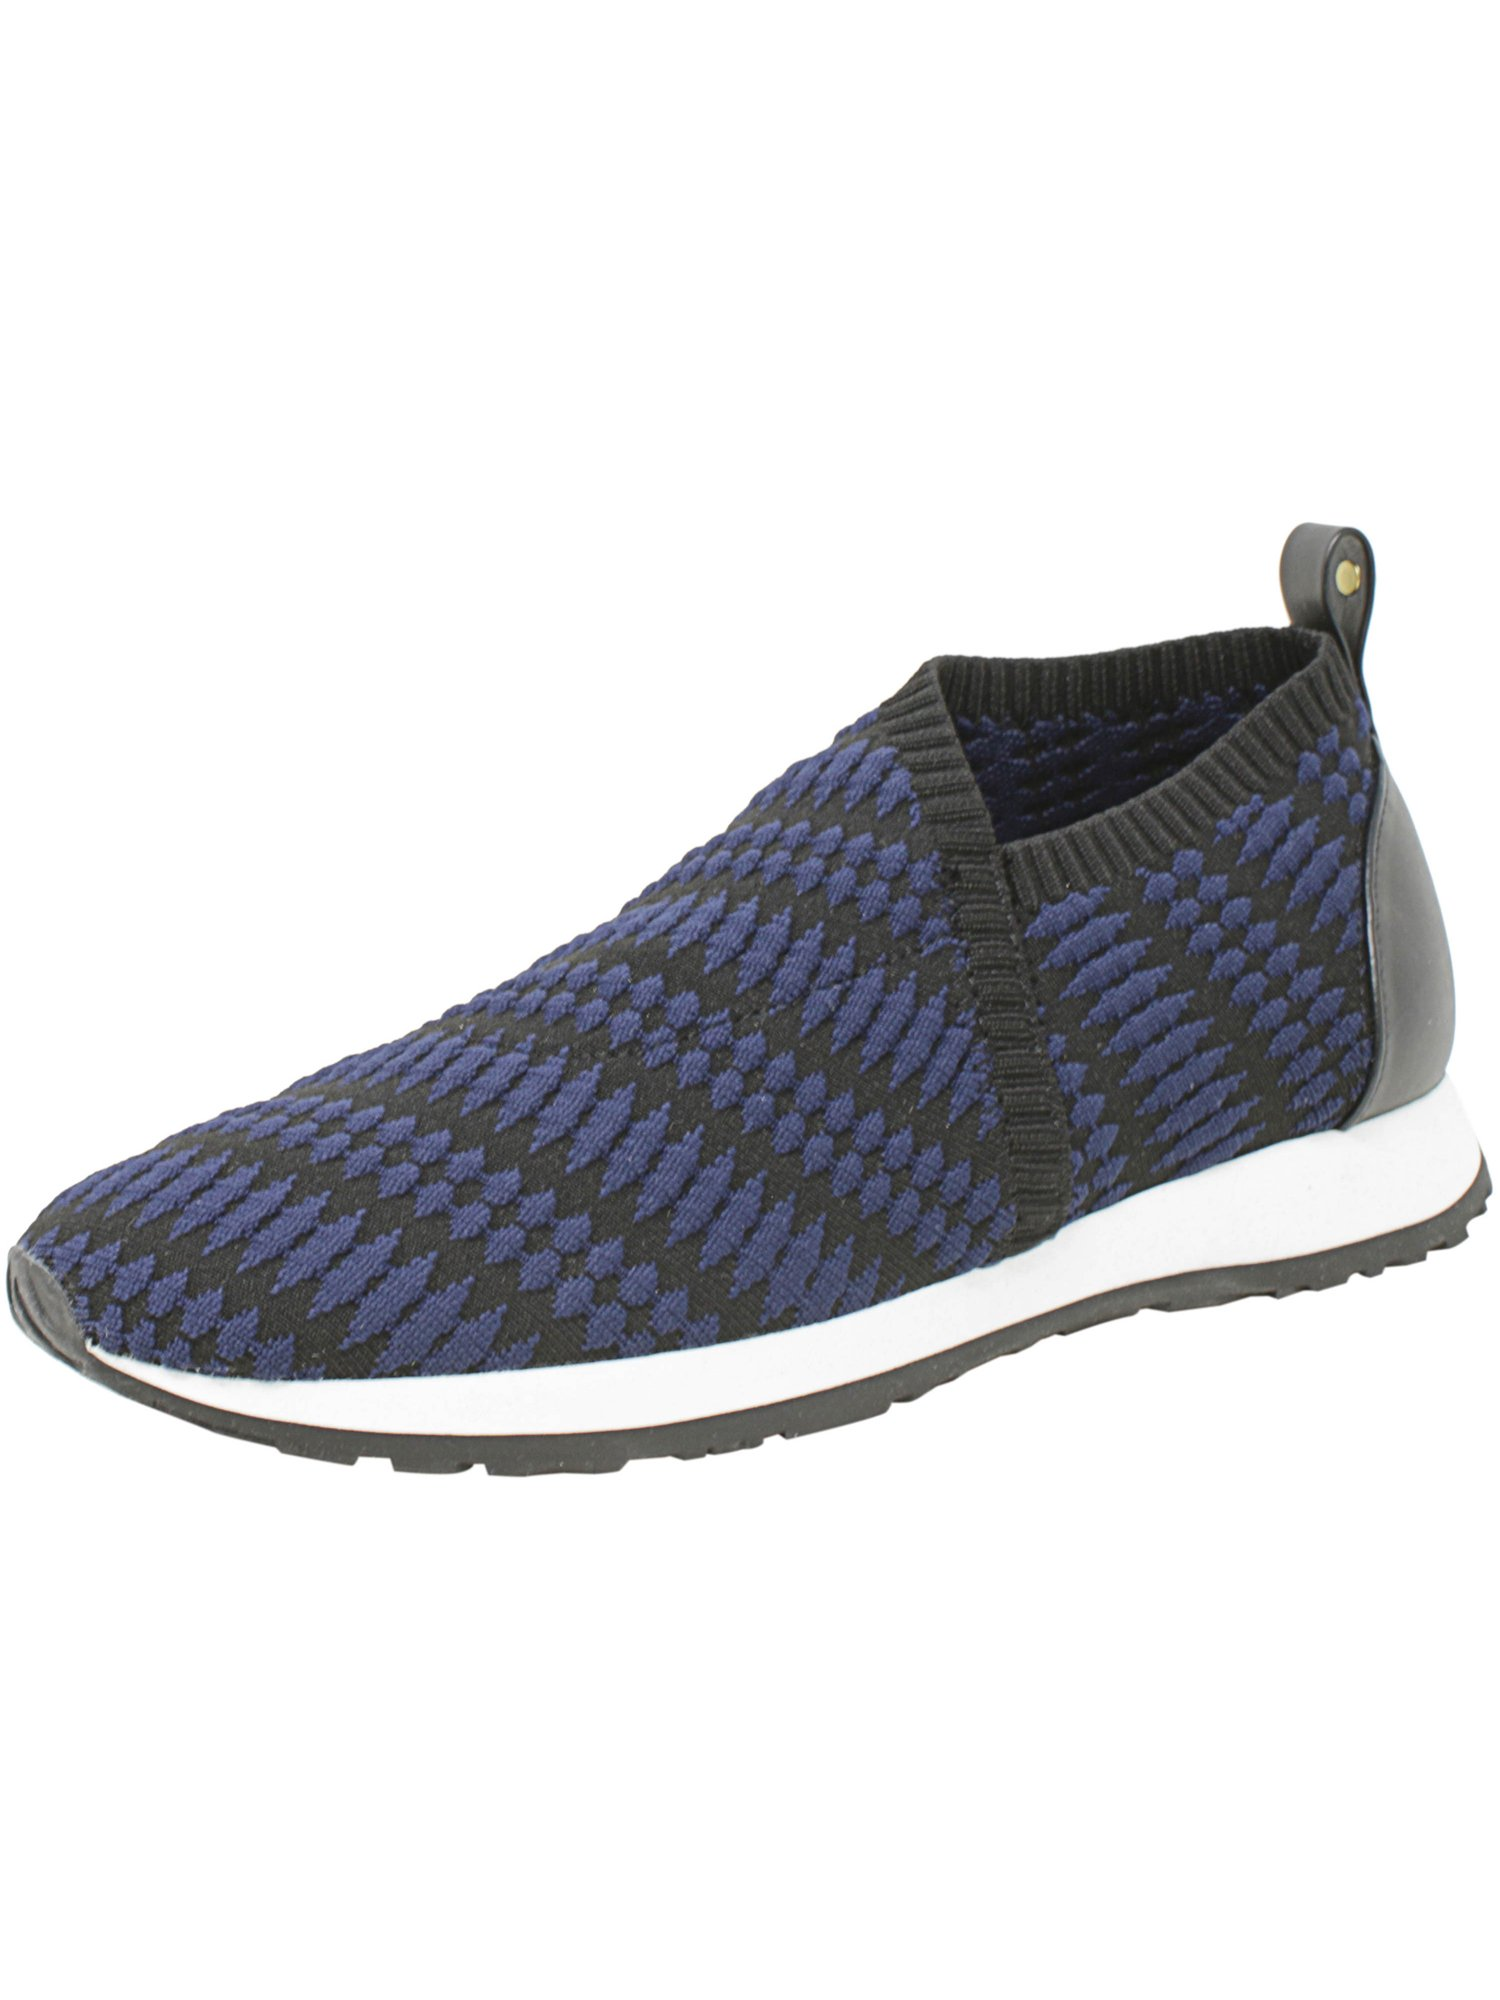 5e3e4da1674 Taryn Rose Women s Caren Sneaker. Walmart Global Product - See details in  description. 0 Reviews 0.0 5 stars